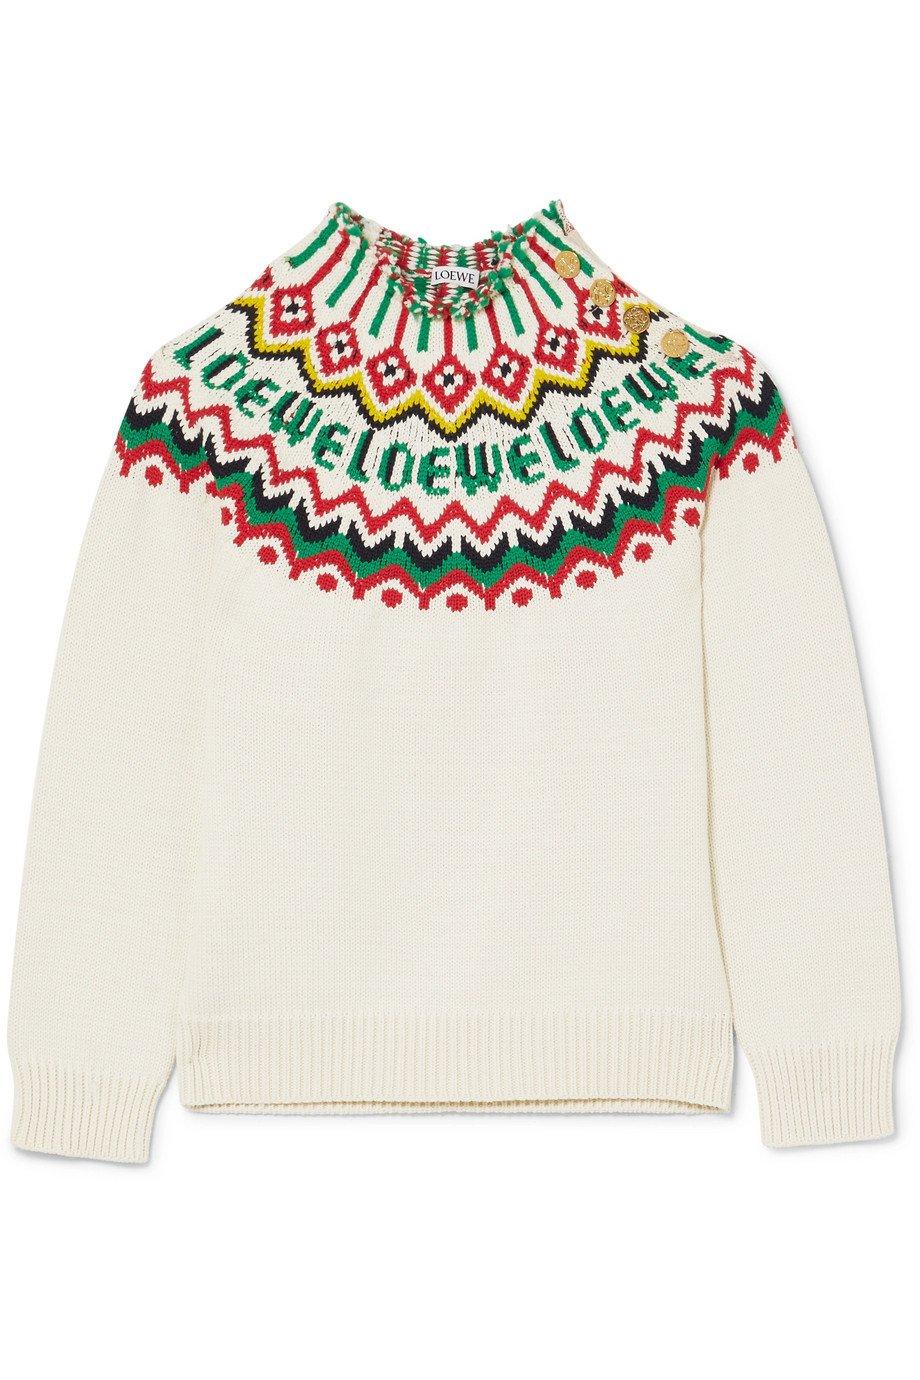 Loewe   Fair Isle cotton-blend sweater   NET-A-PORTER.COM